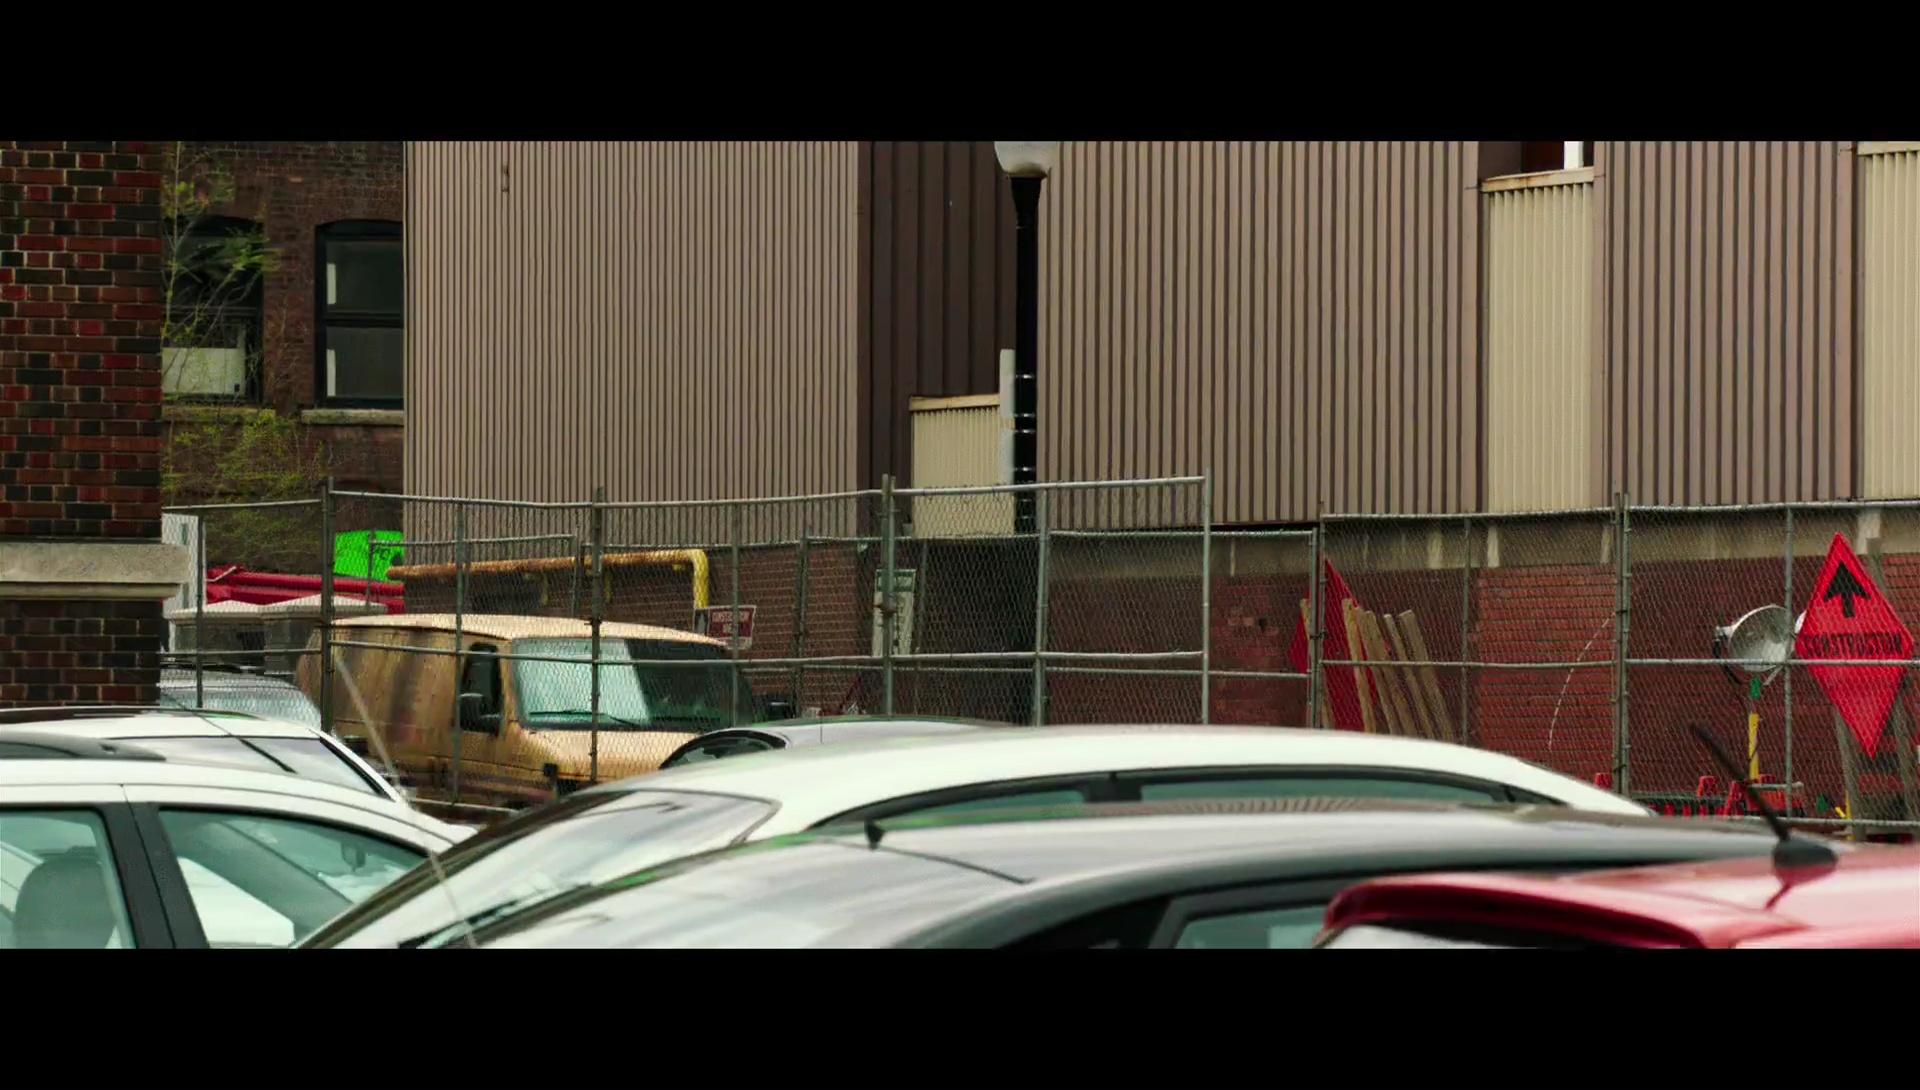 xXx 3 Reactivado 1080p Lat-Cast-Ing 5.1 (2017)